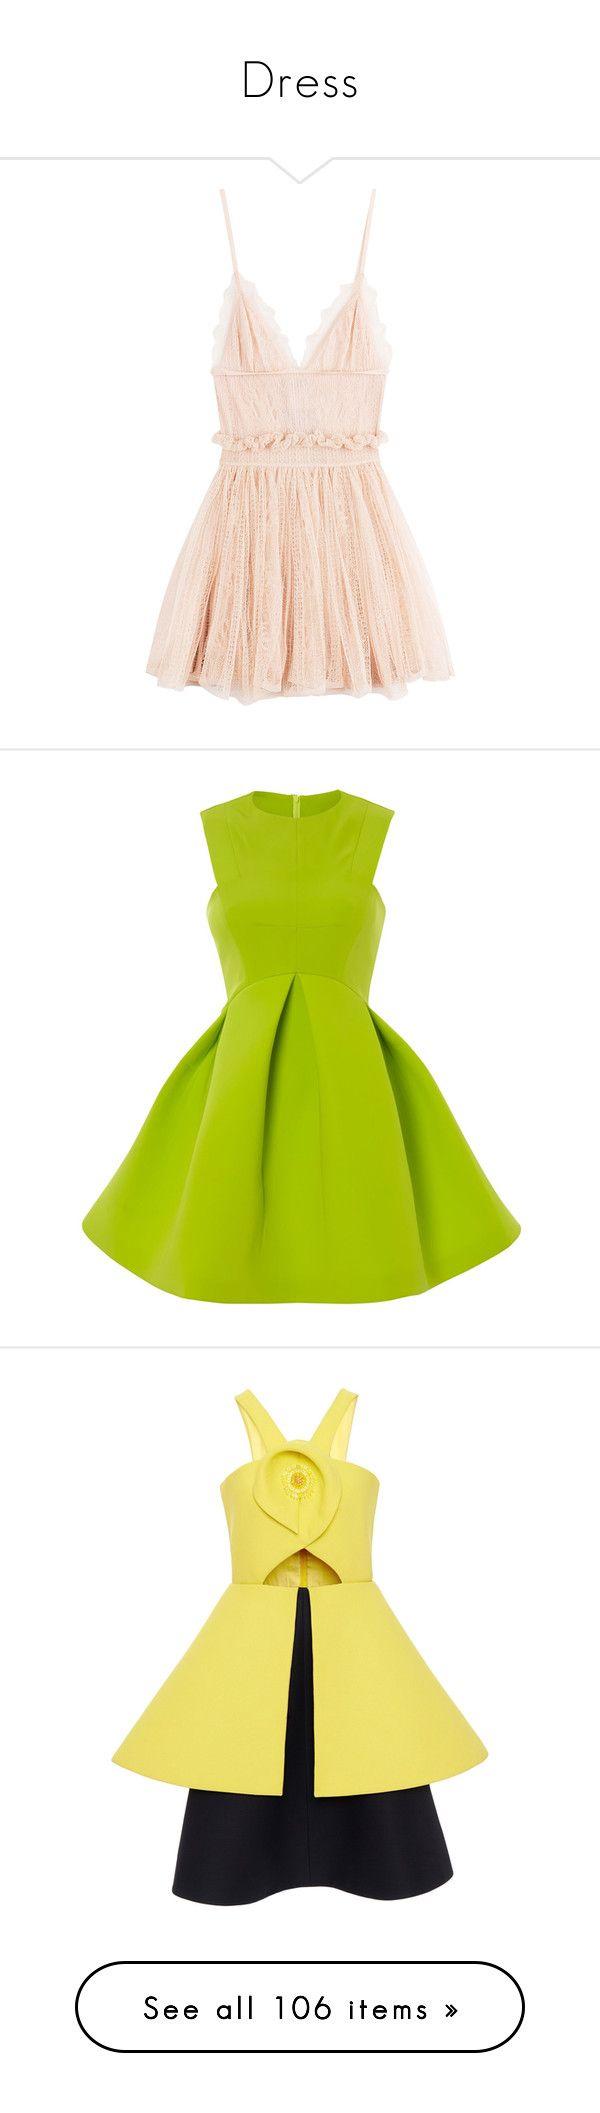 """Dress"" by janjanzira ❤ liked on Polyvore featuring dresses, vestidos, short dress, beige, mini dress, v neck cocktail dress, short skirts, lace dress, pink lace cocktail dress and short dresses"